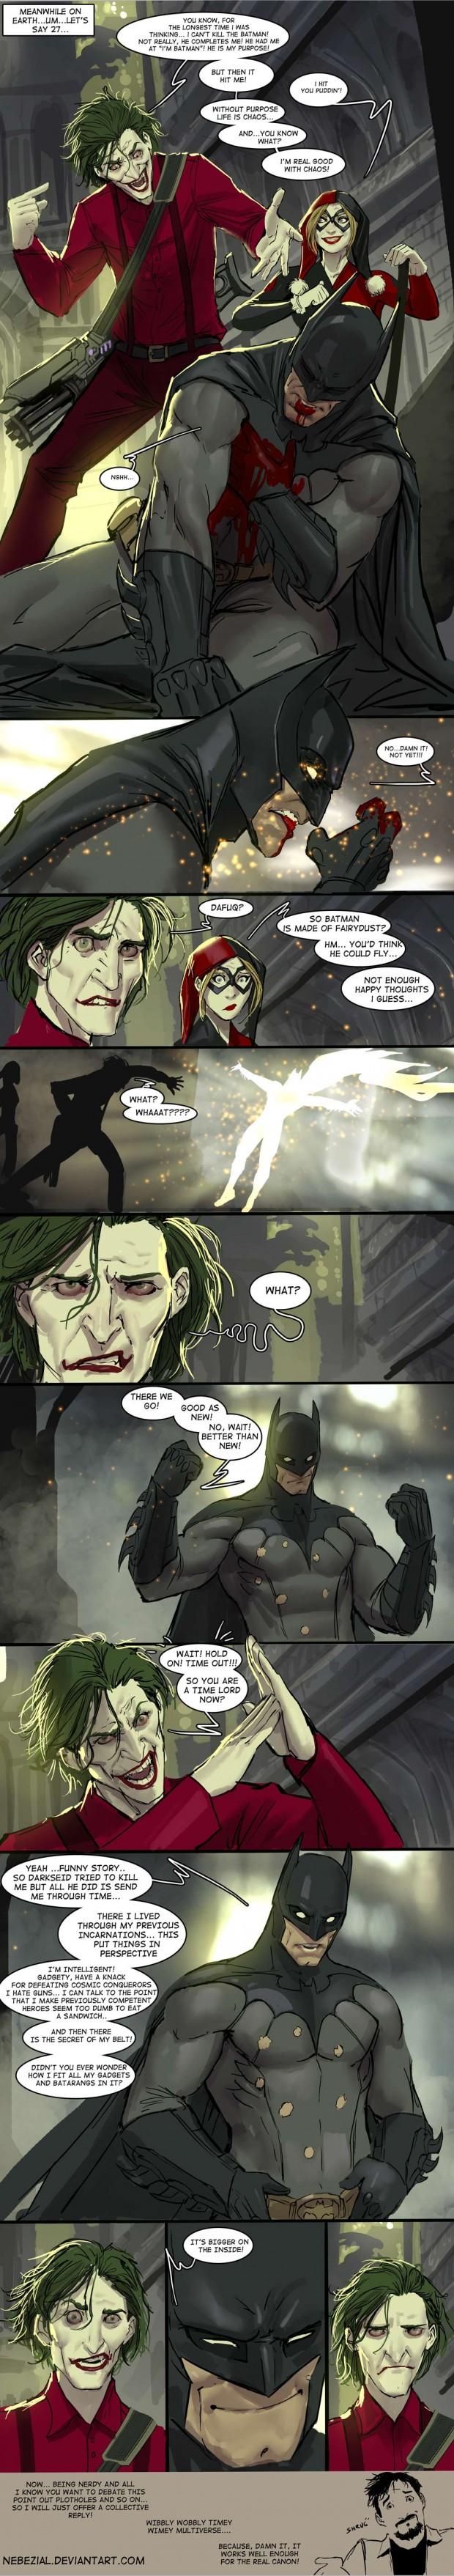 it_s_simple__we_kill_the_doctor___no_wait__batman__by_nebezial-d6yi2xh